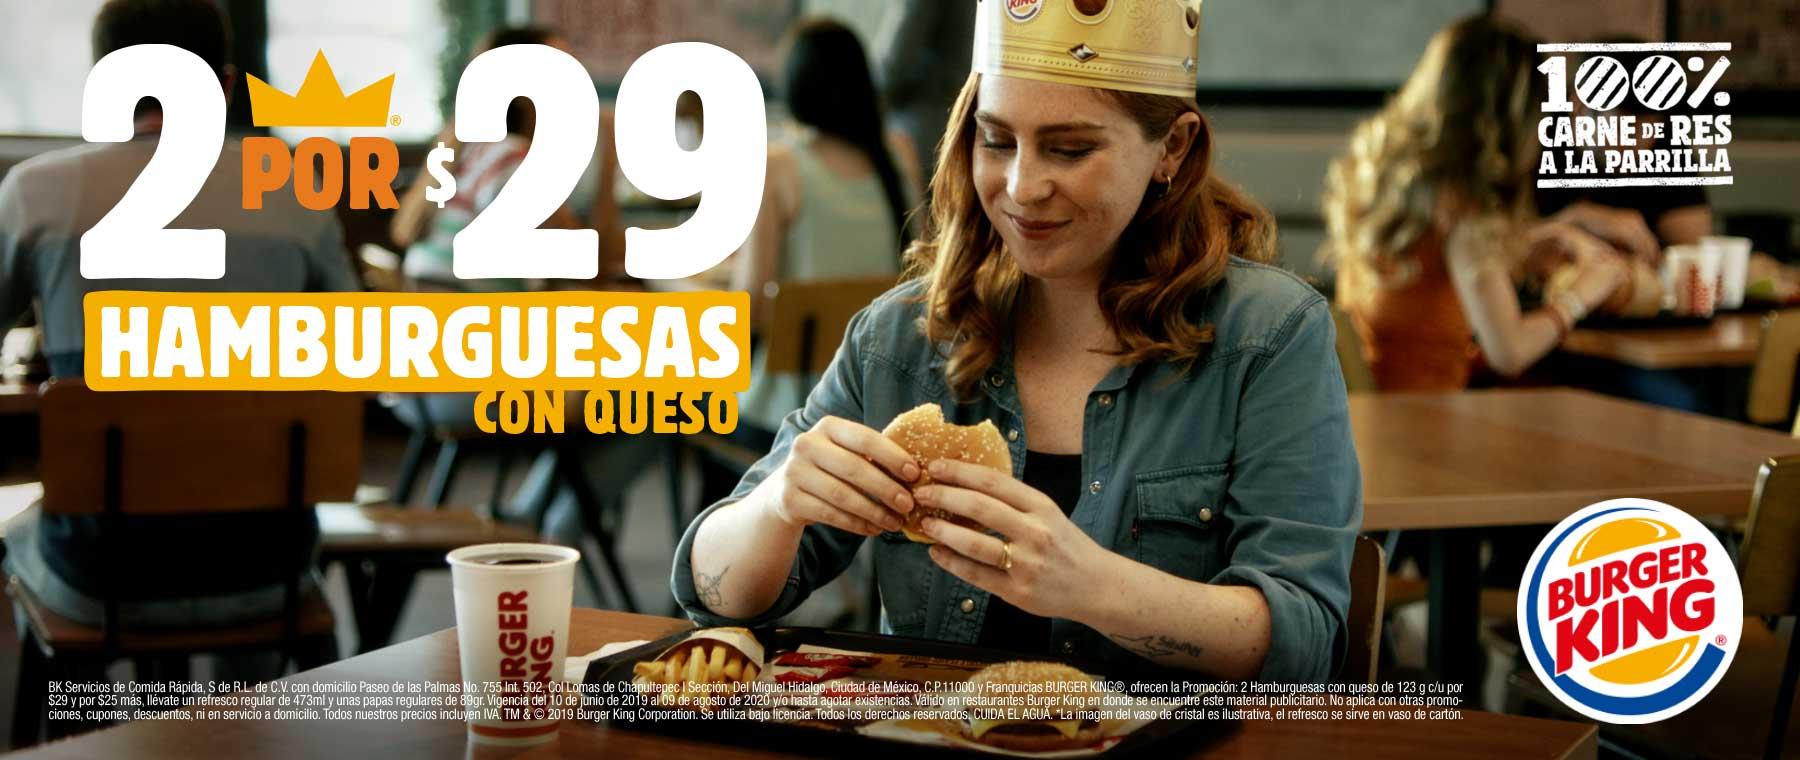 Burger King Hamburguesa con queso 2x 29